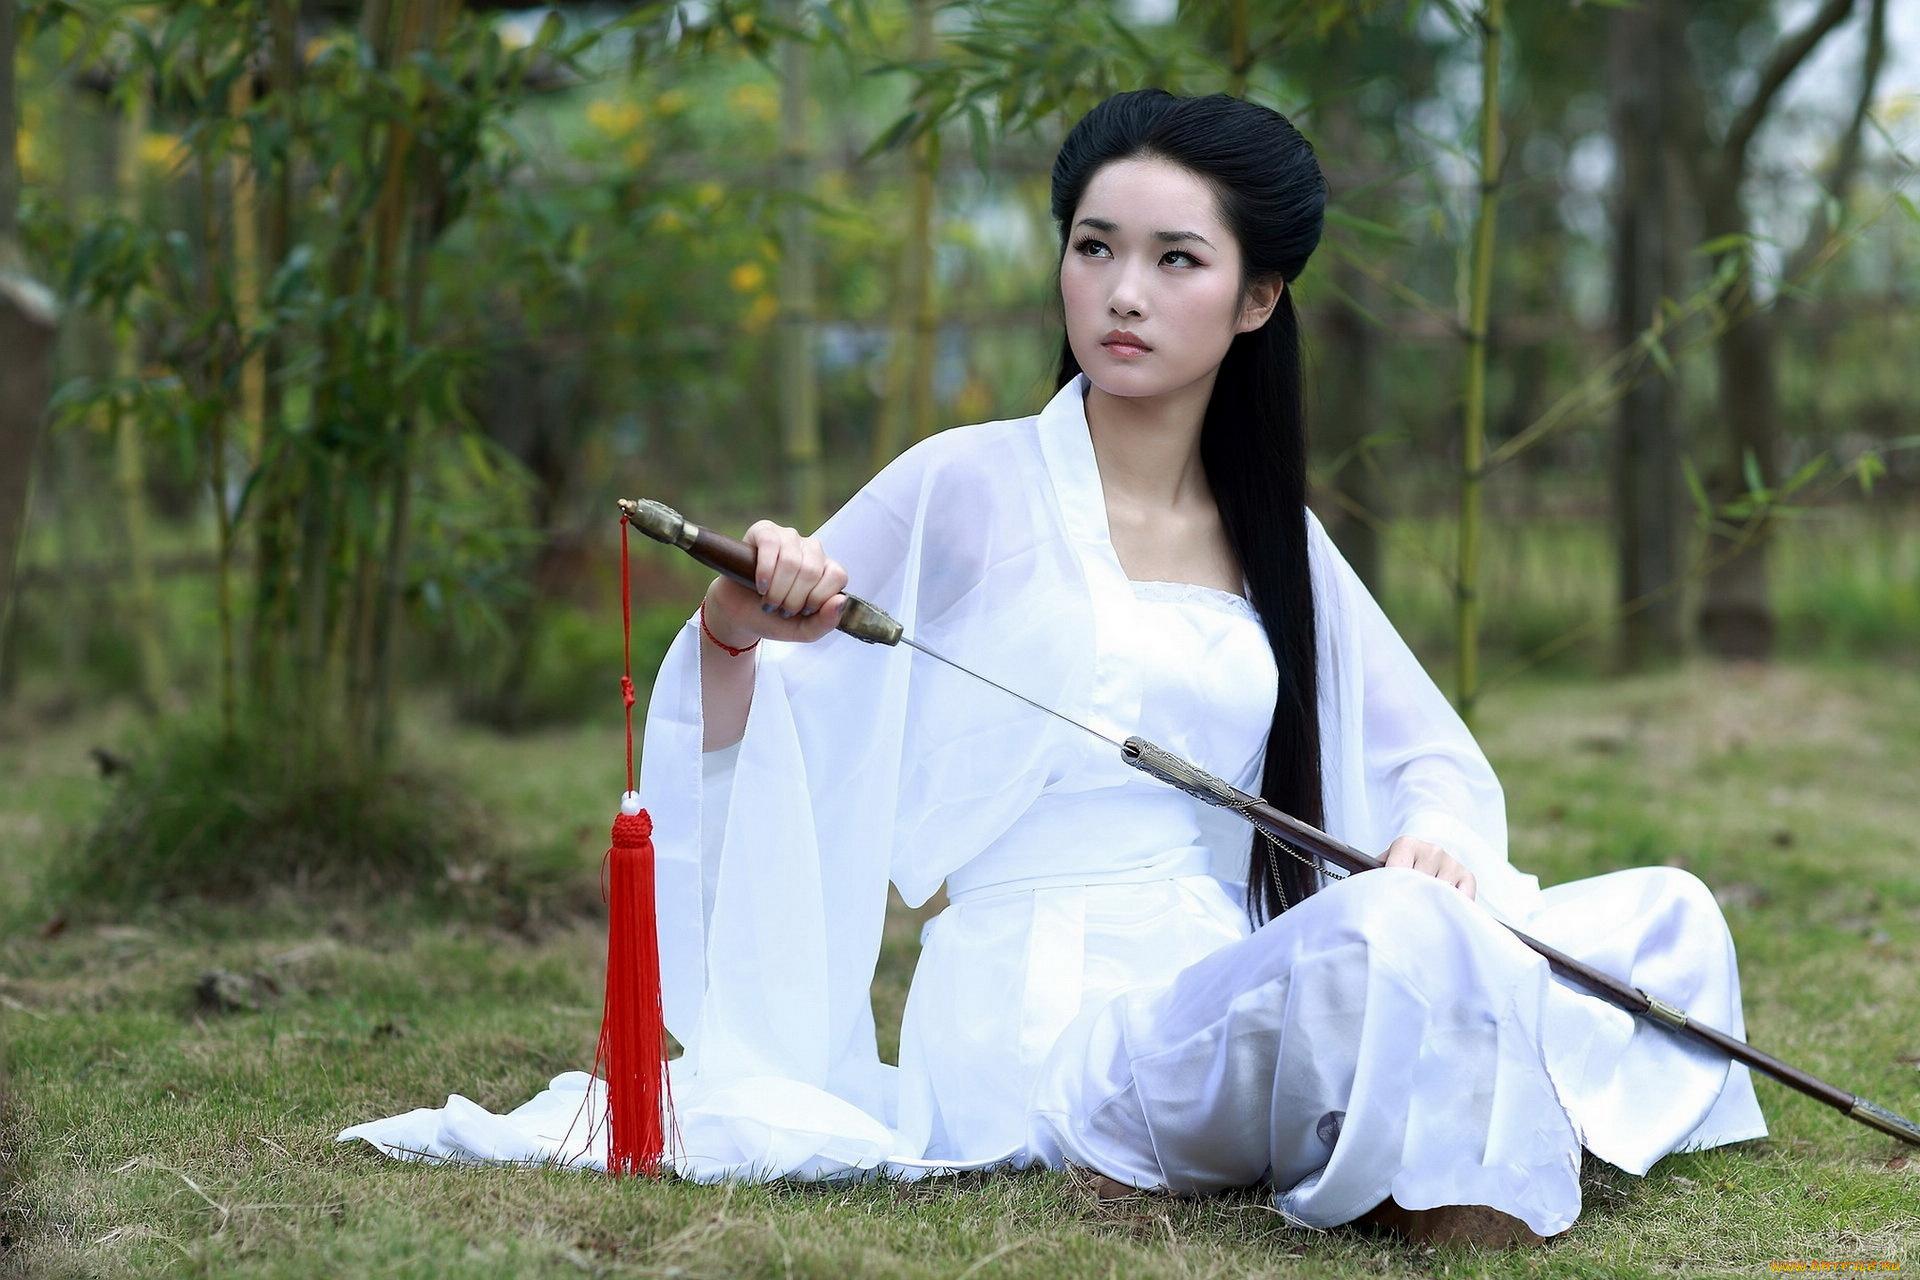 japanese-movie-girl-blade-naked-pornstars-bent-over